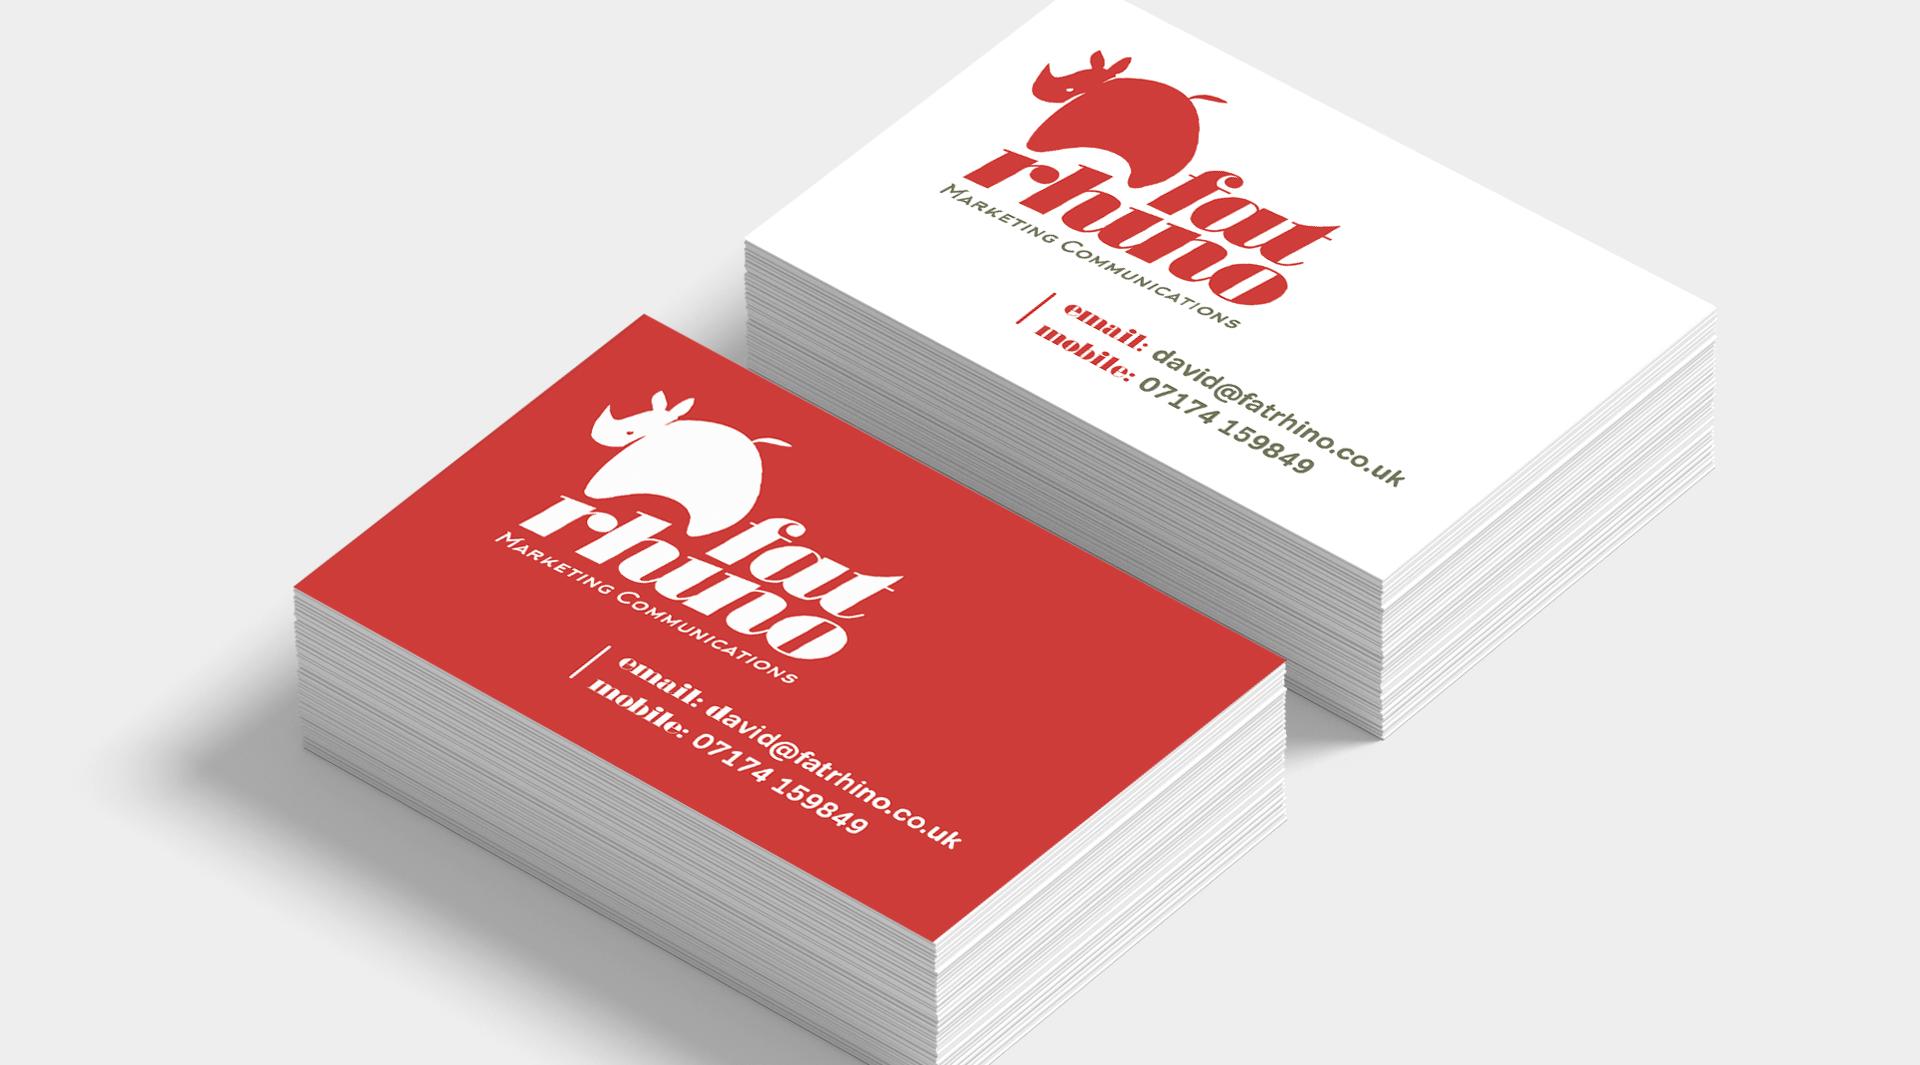 3_Business_Card_Mockup_1 1920x1065.jpg